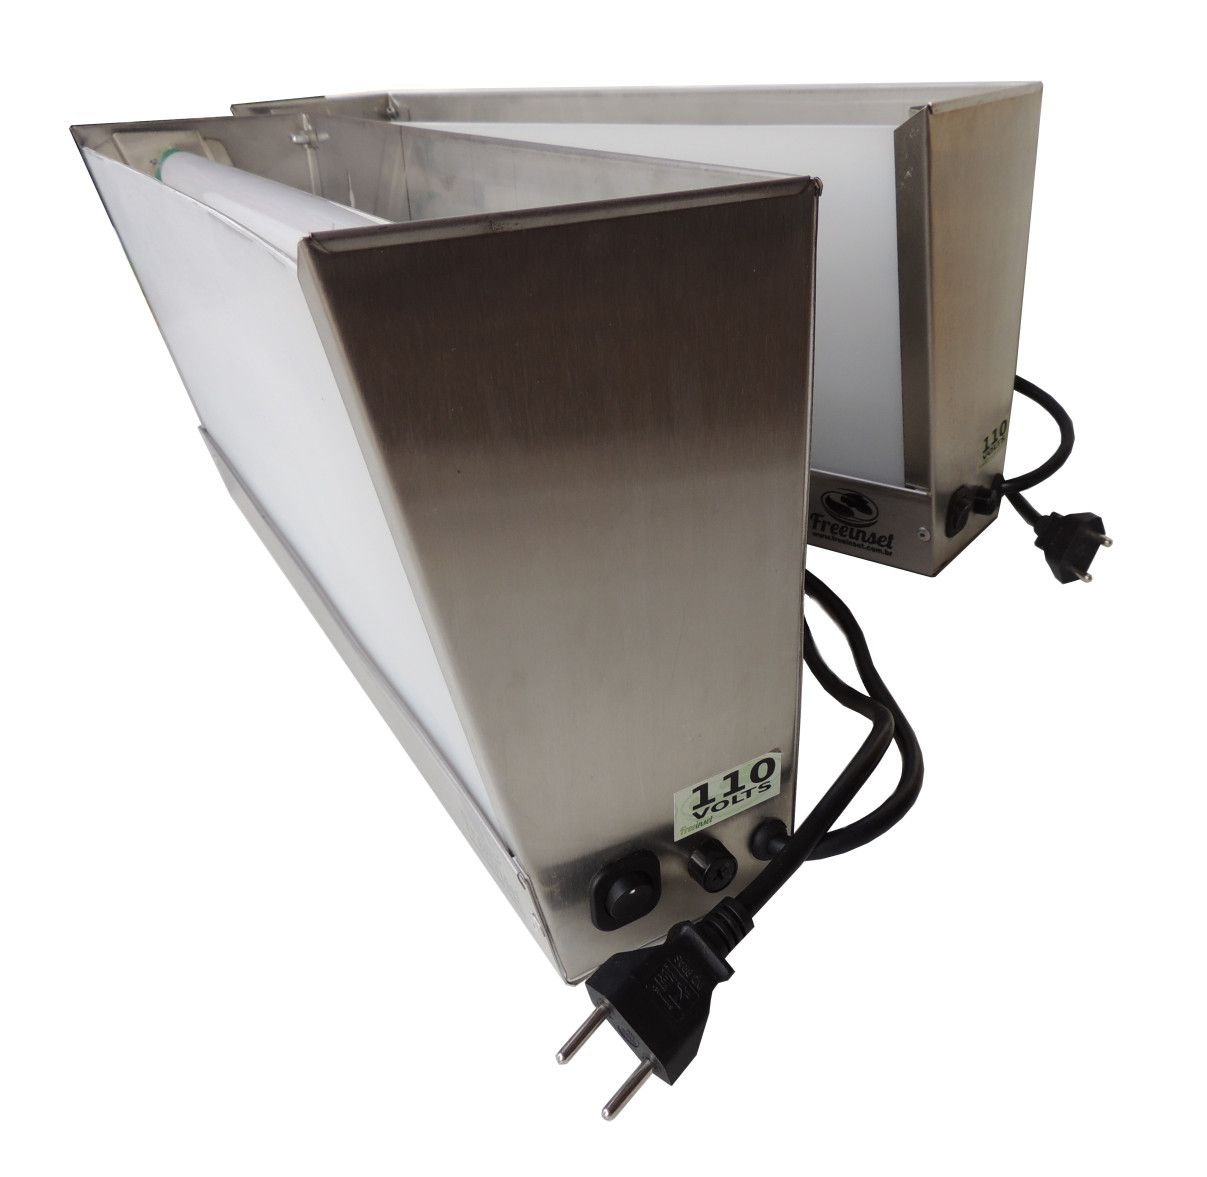 Box 1 Armadilha Luminosa Matar Mosca mosquito Inox 45w 80m2